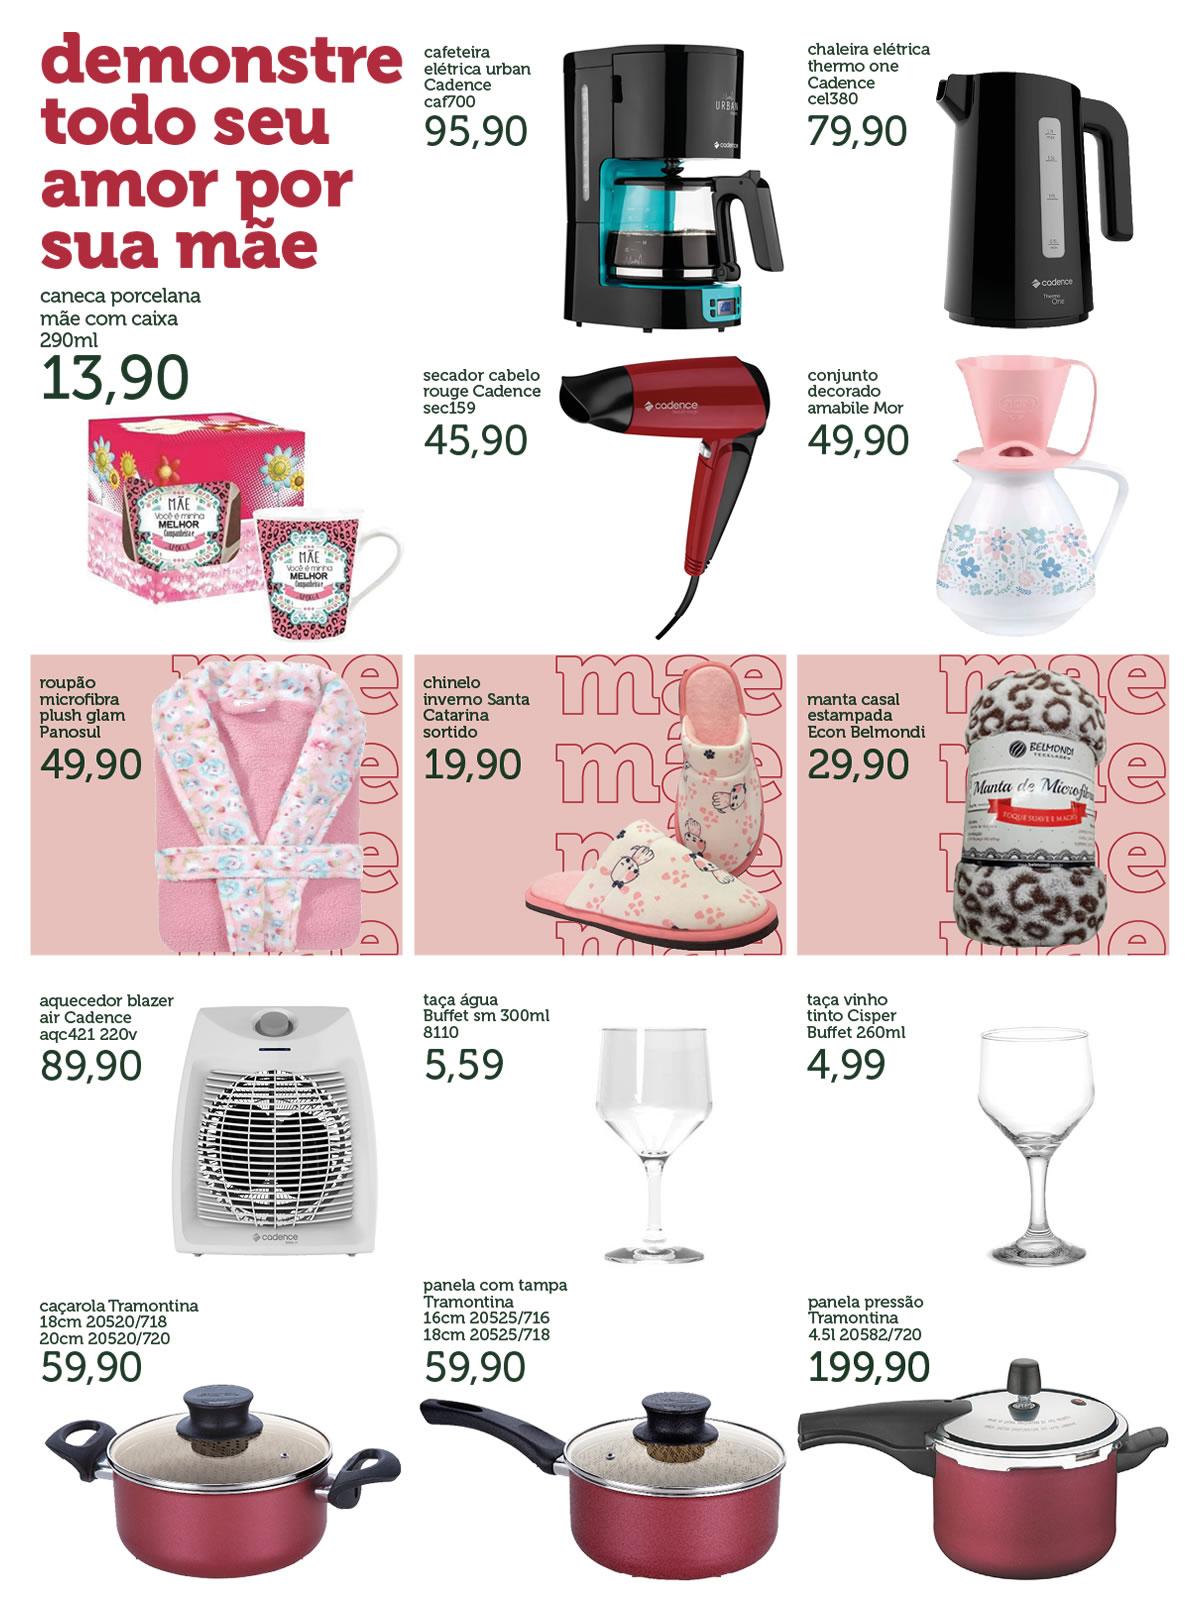 tabloide-abril19-concordia-joa-FINAL18